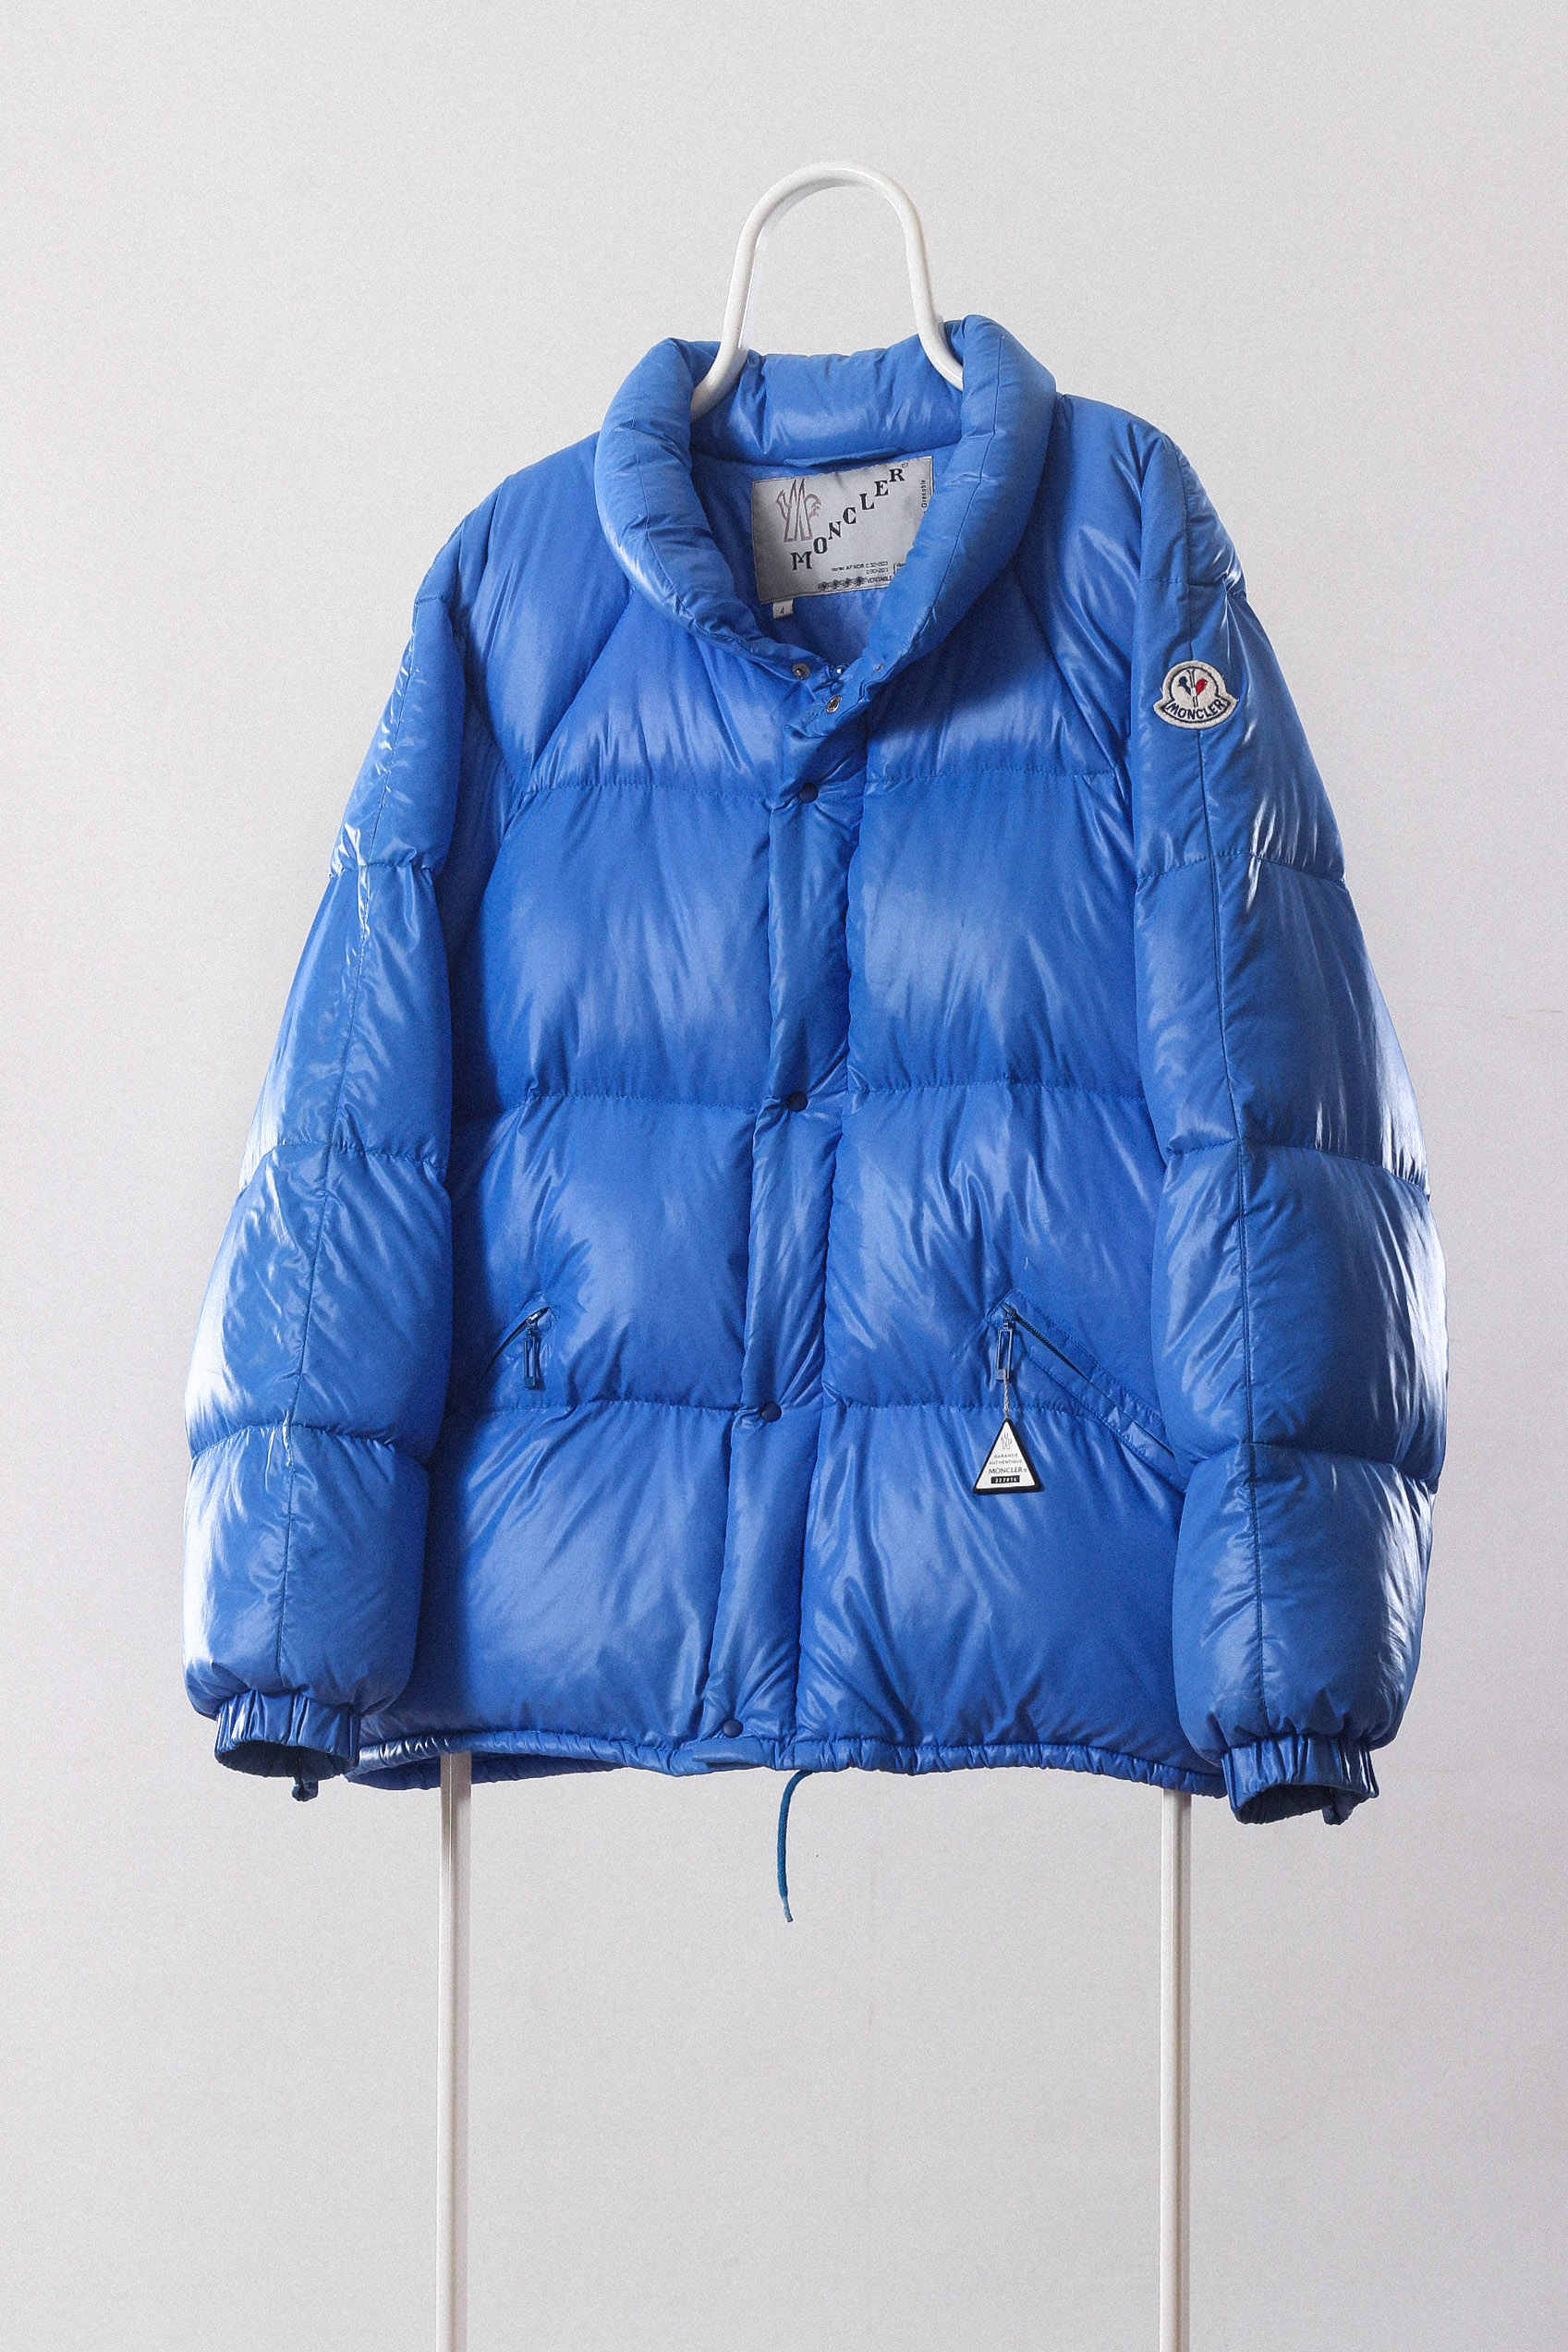 da318ce43 80's Vintage Mens MONCLER Grenoble Puffa Puffer Down Padded Winter Jacket  Coat Blue Neon France Paris